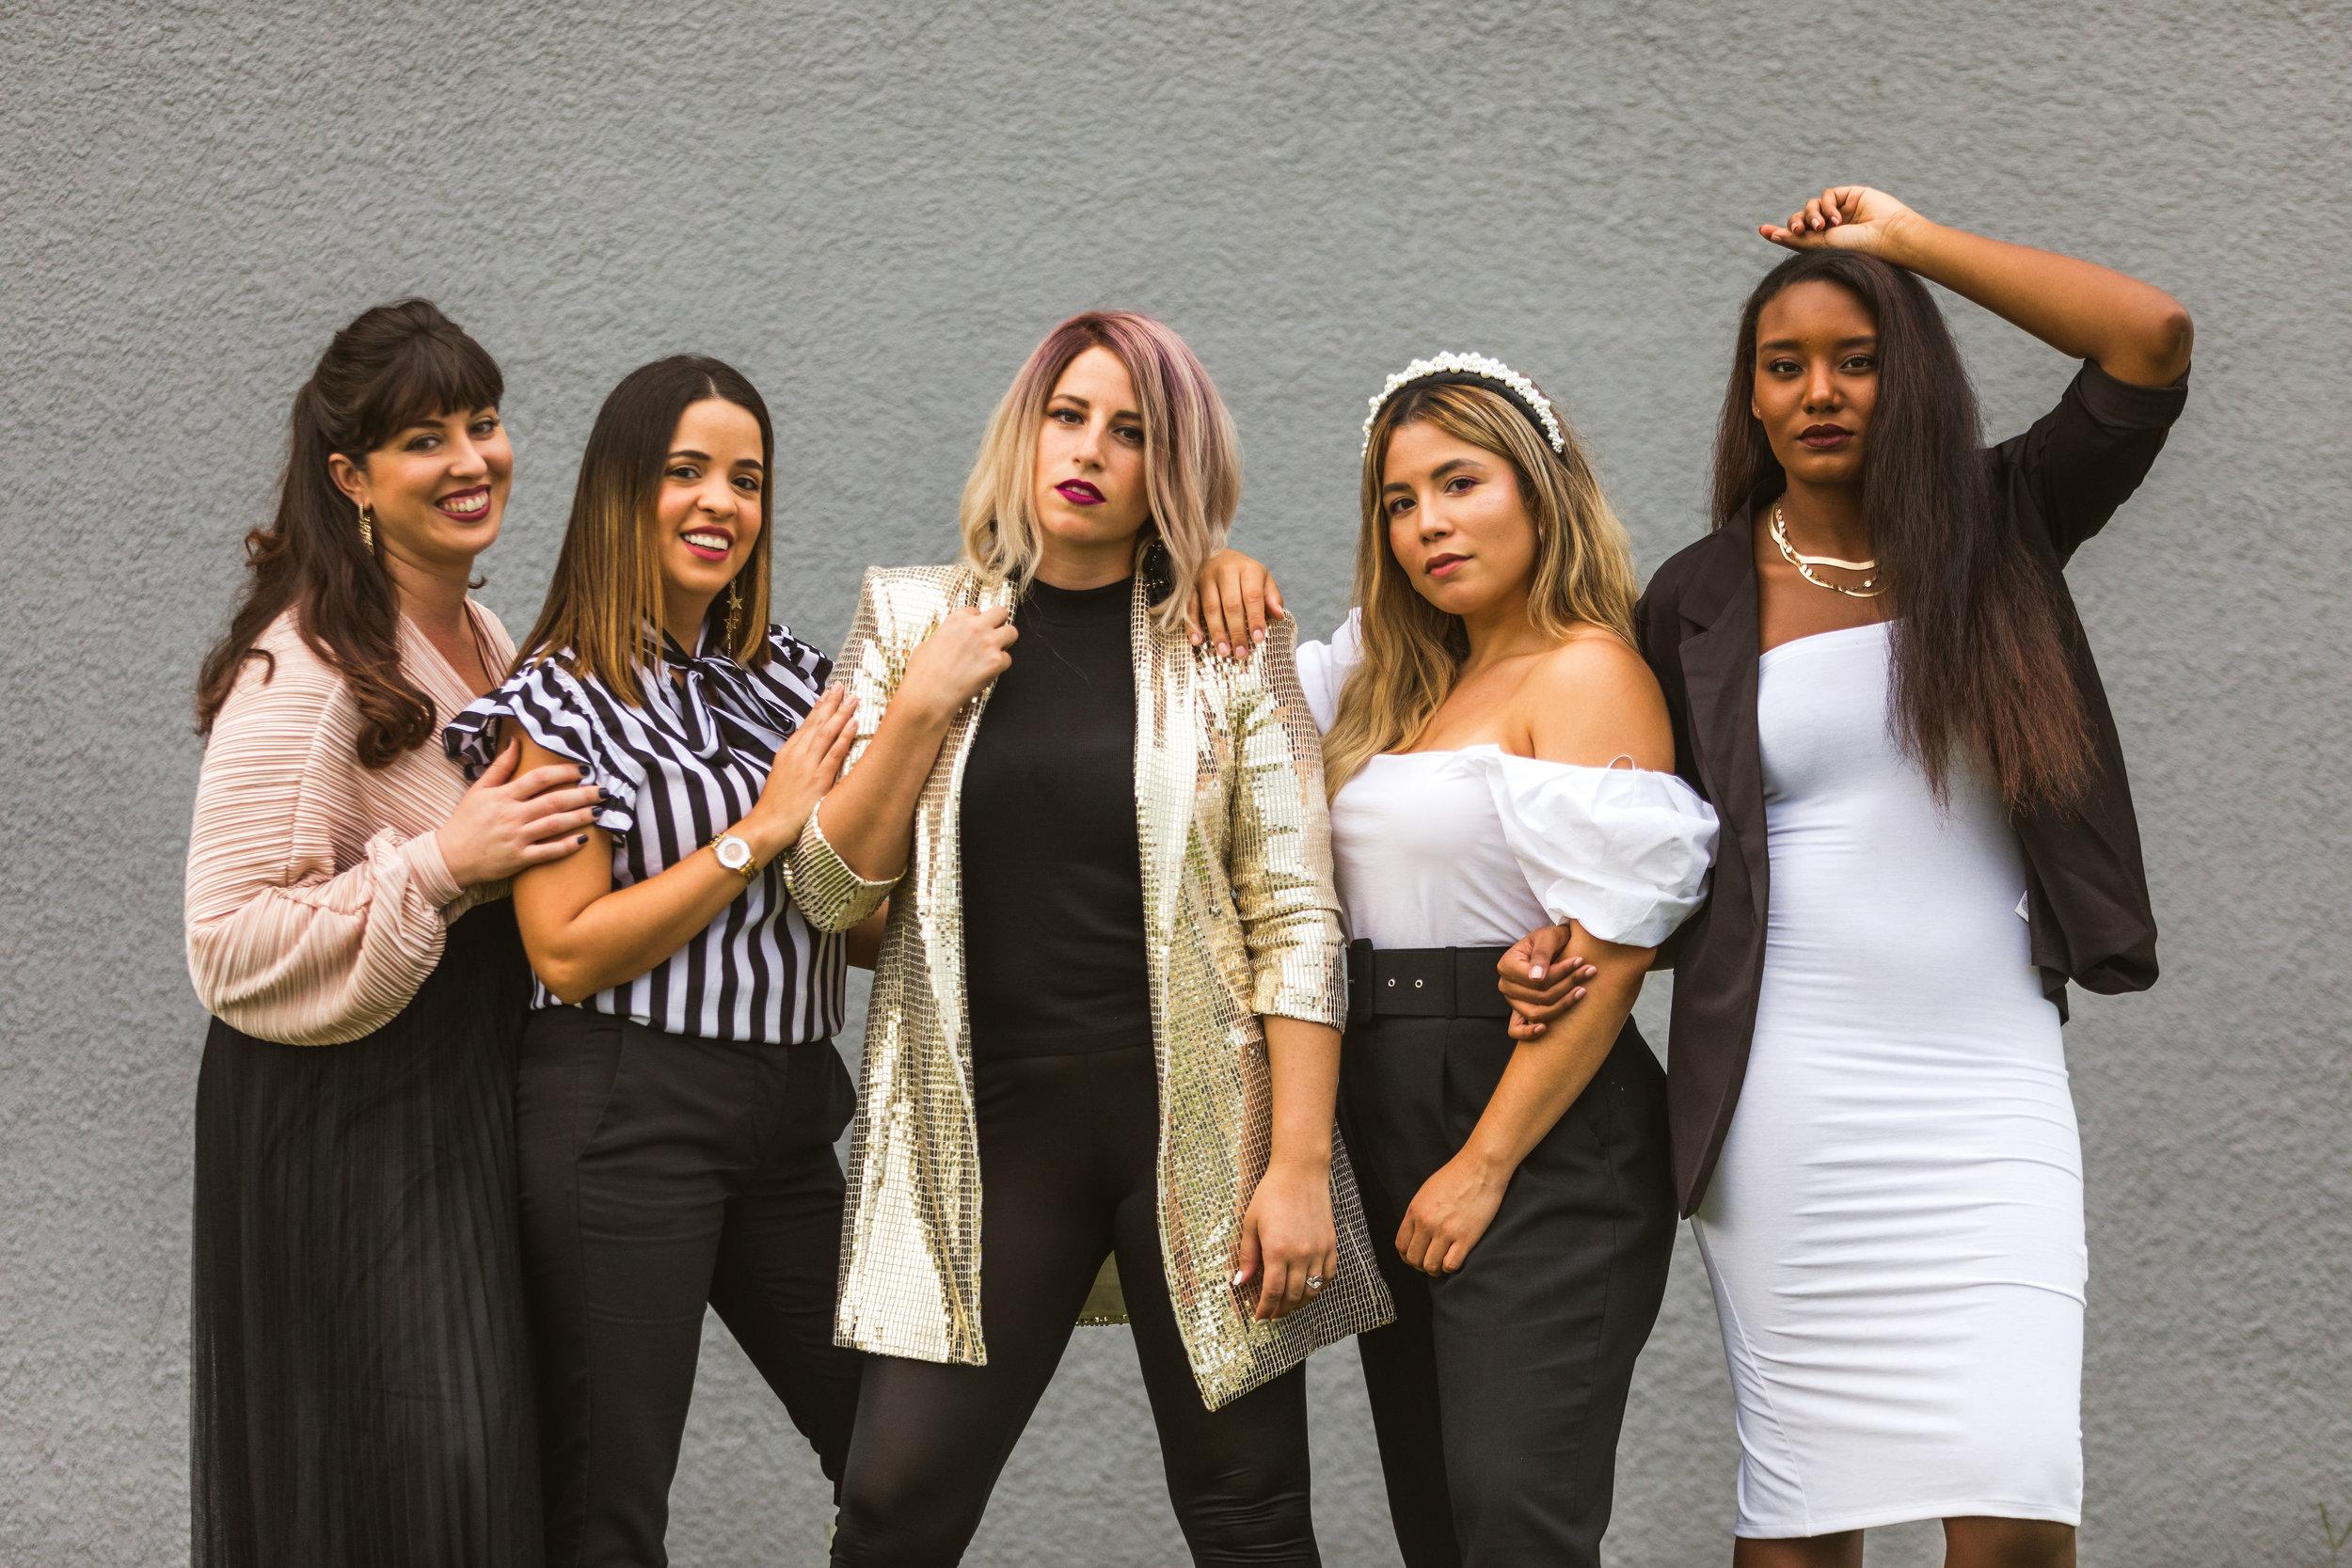 Management Team - Meet: Melissa, Vanessa, Rebekkah, Trish & Amy